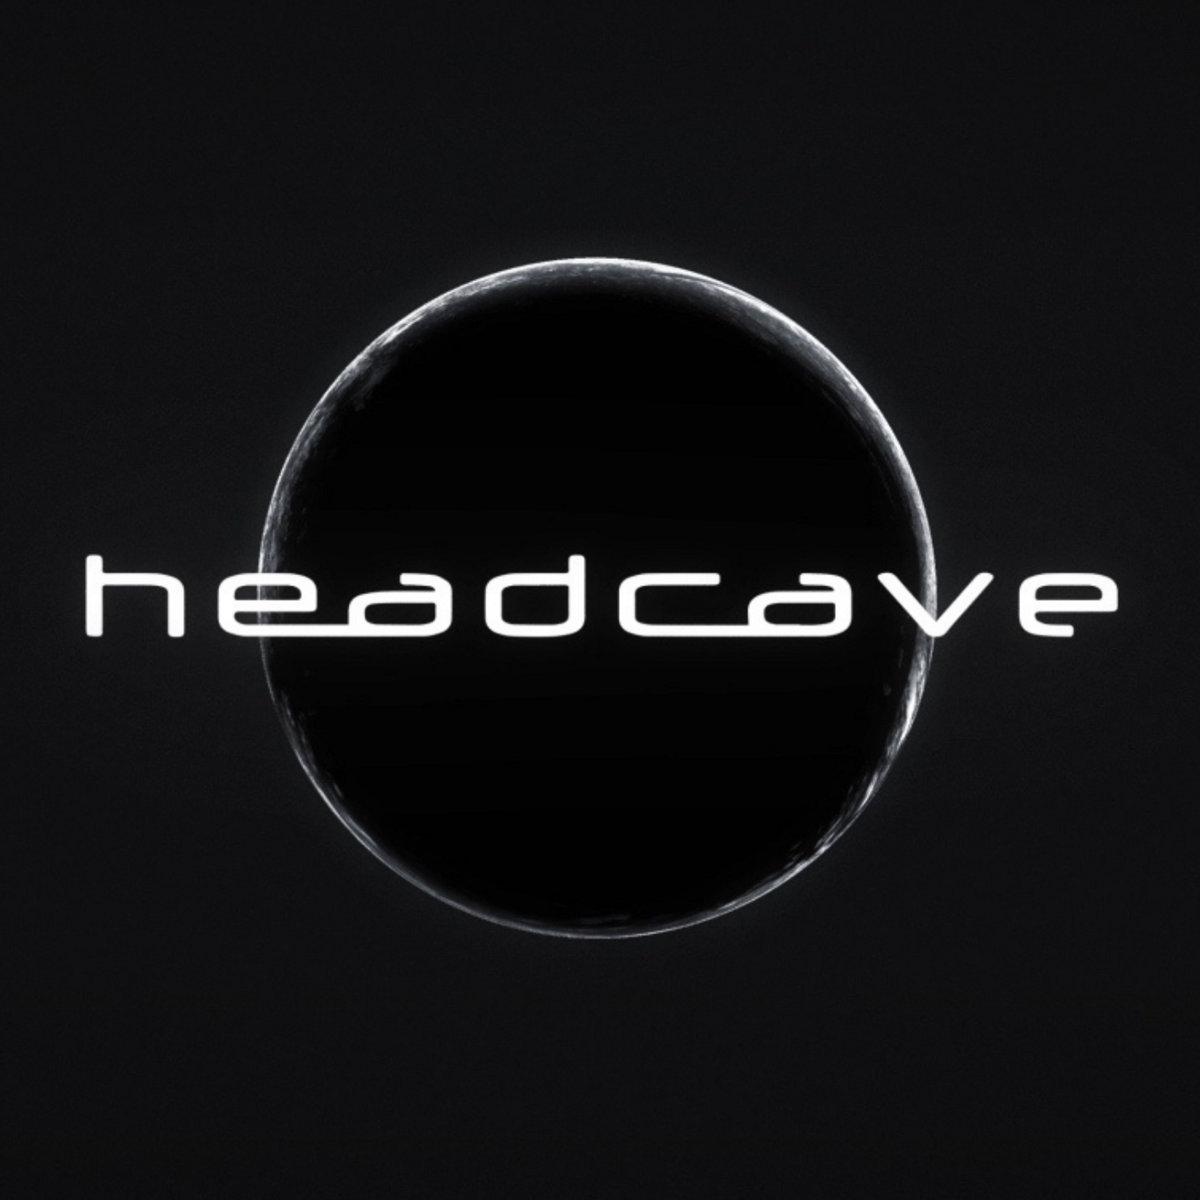 HEADCAVE picture